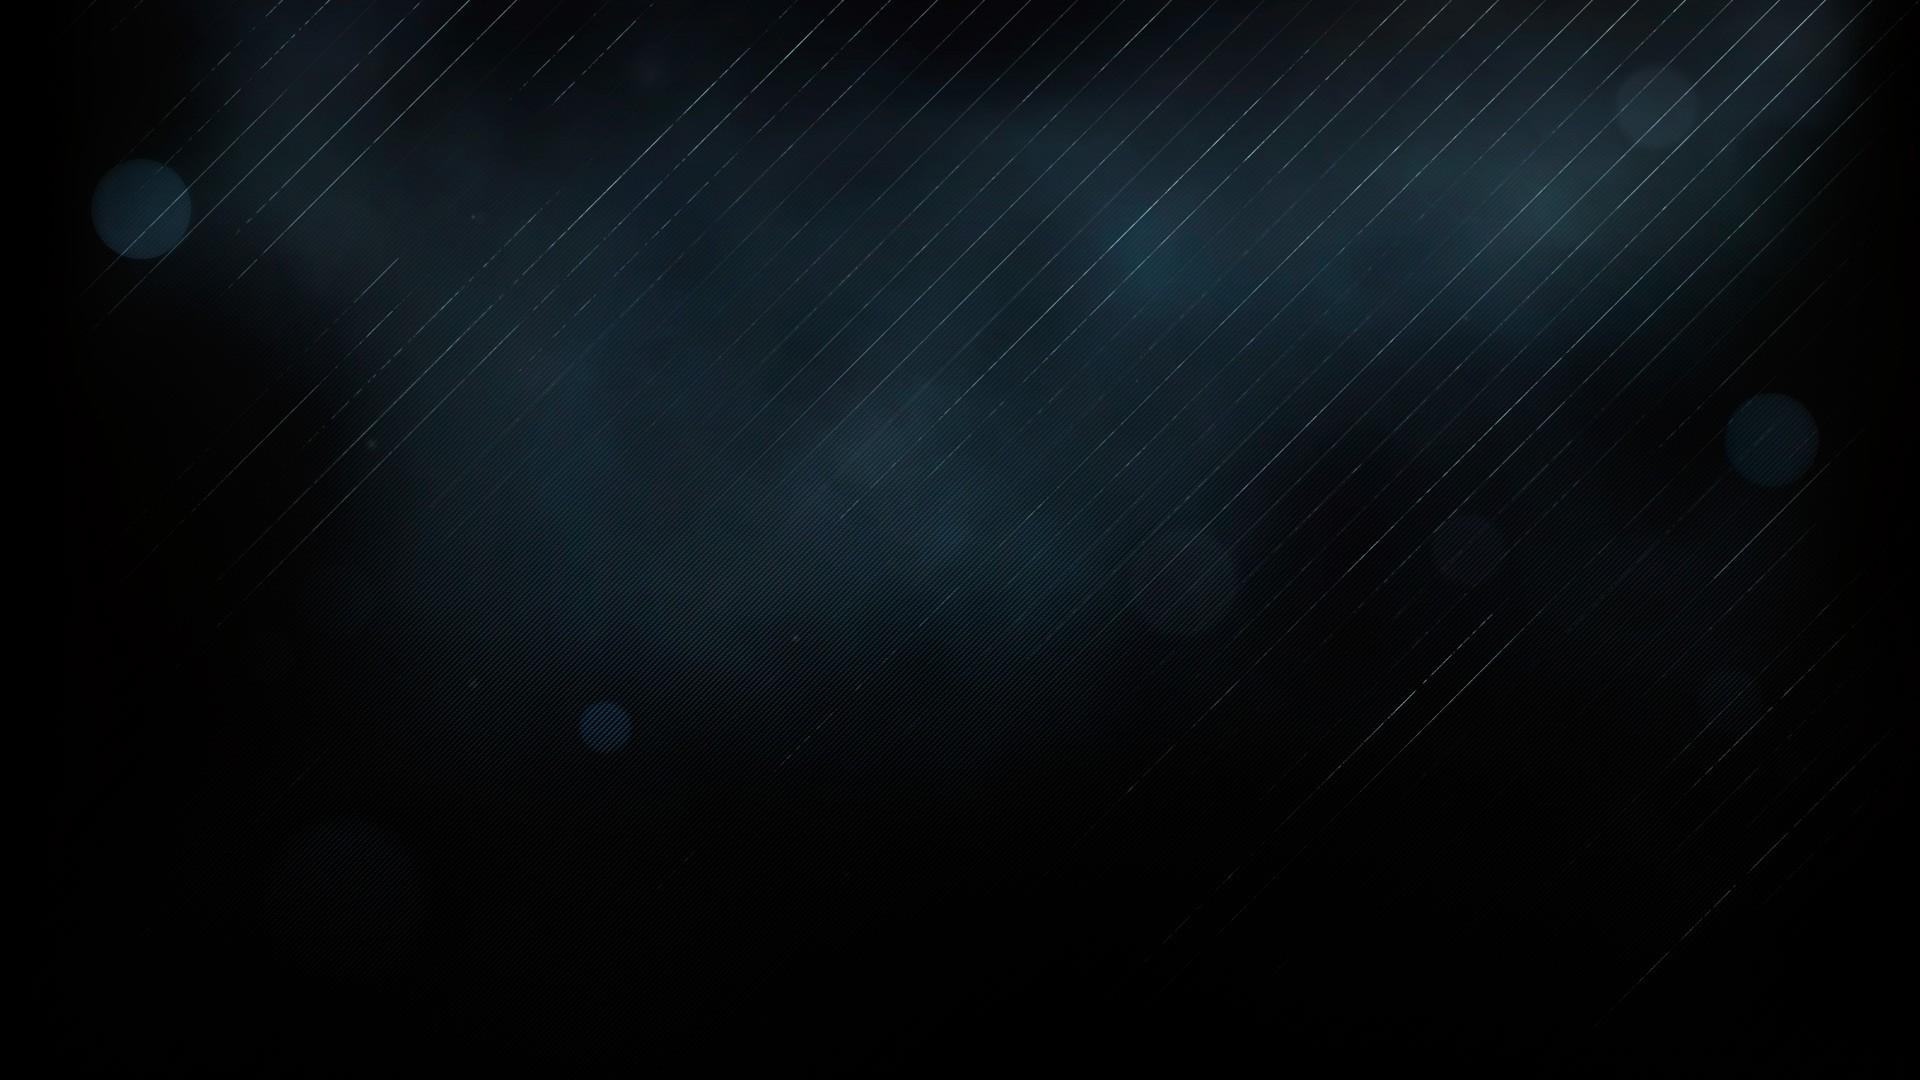 Wallpaper : digital art, black background, night, abstract ...